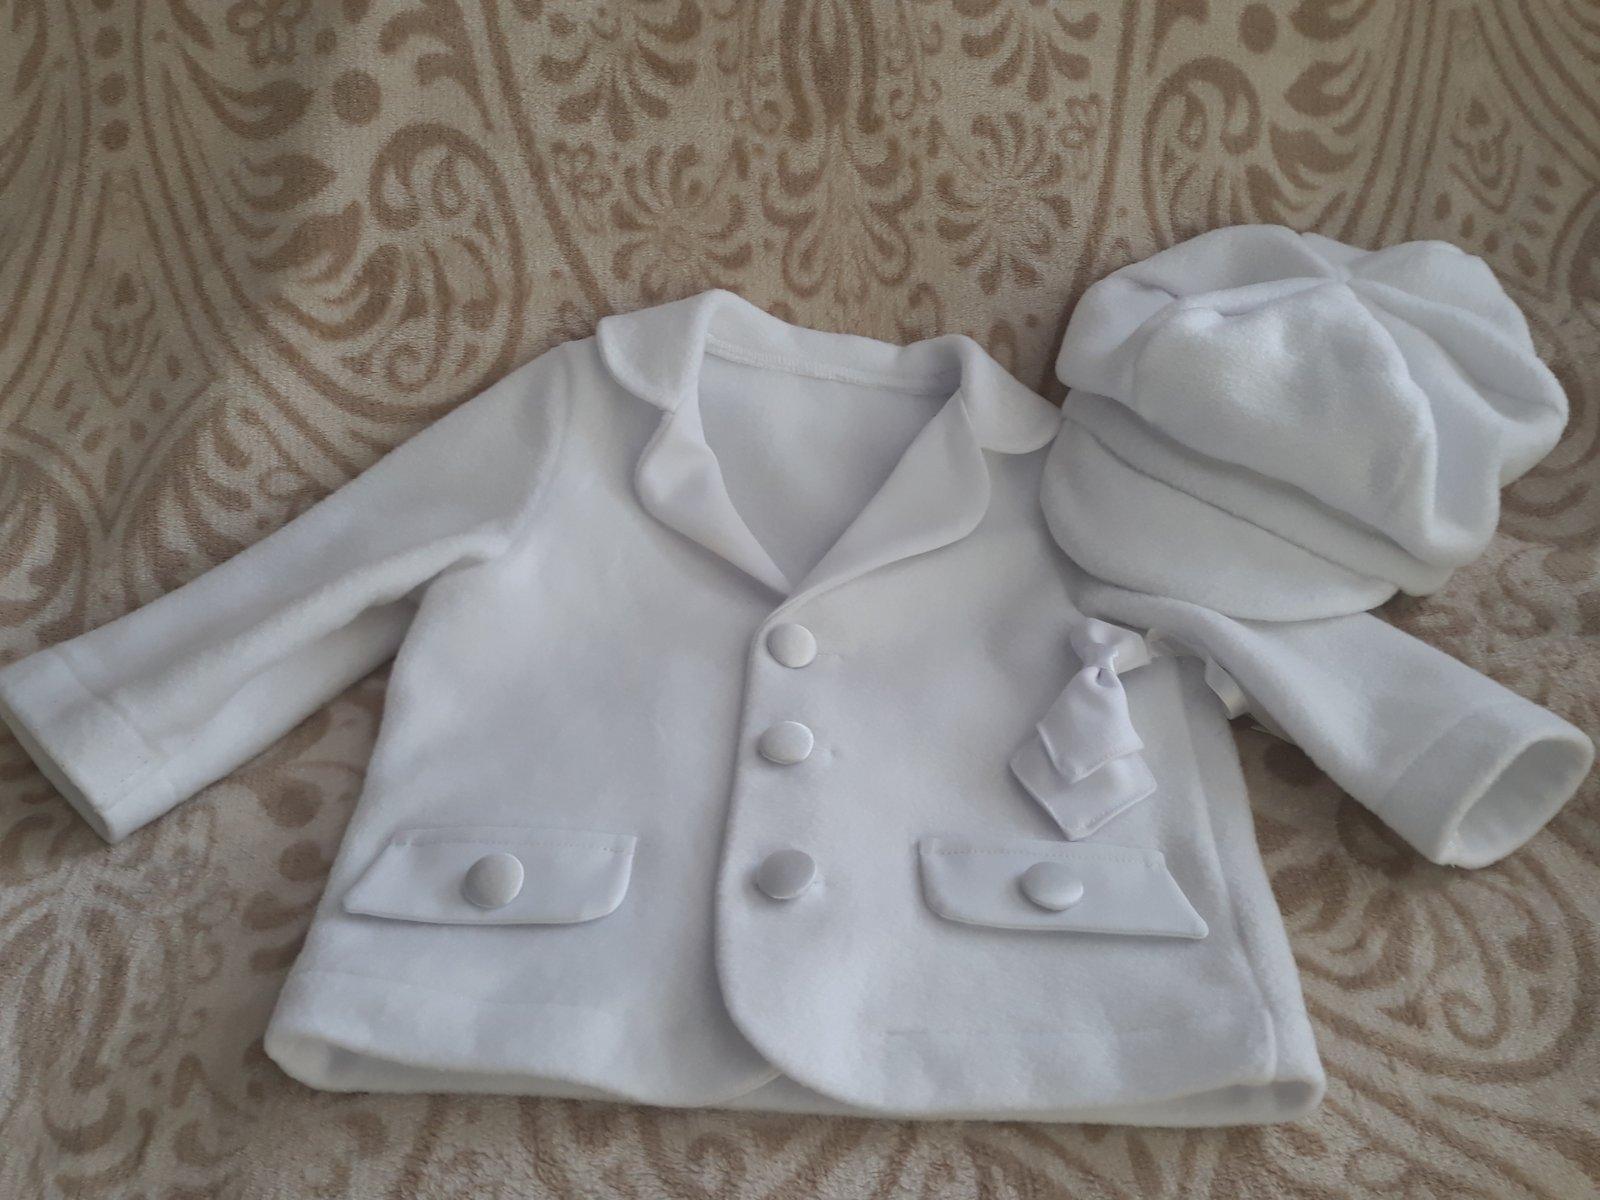 3b52bf39ead8 Biely komplet nohavice a kabátik na krst či svadbu